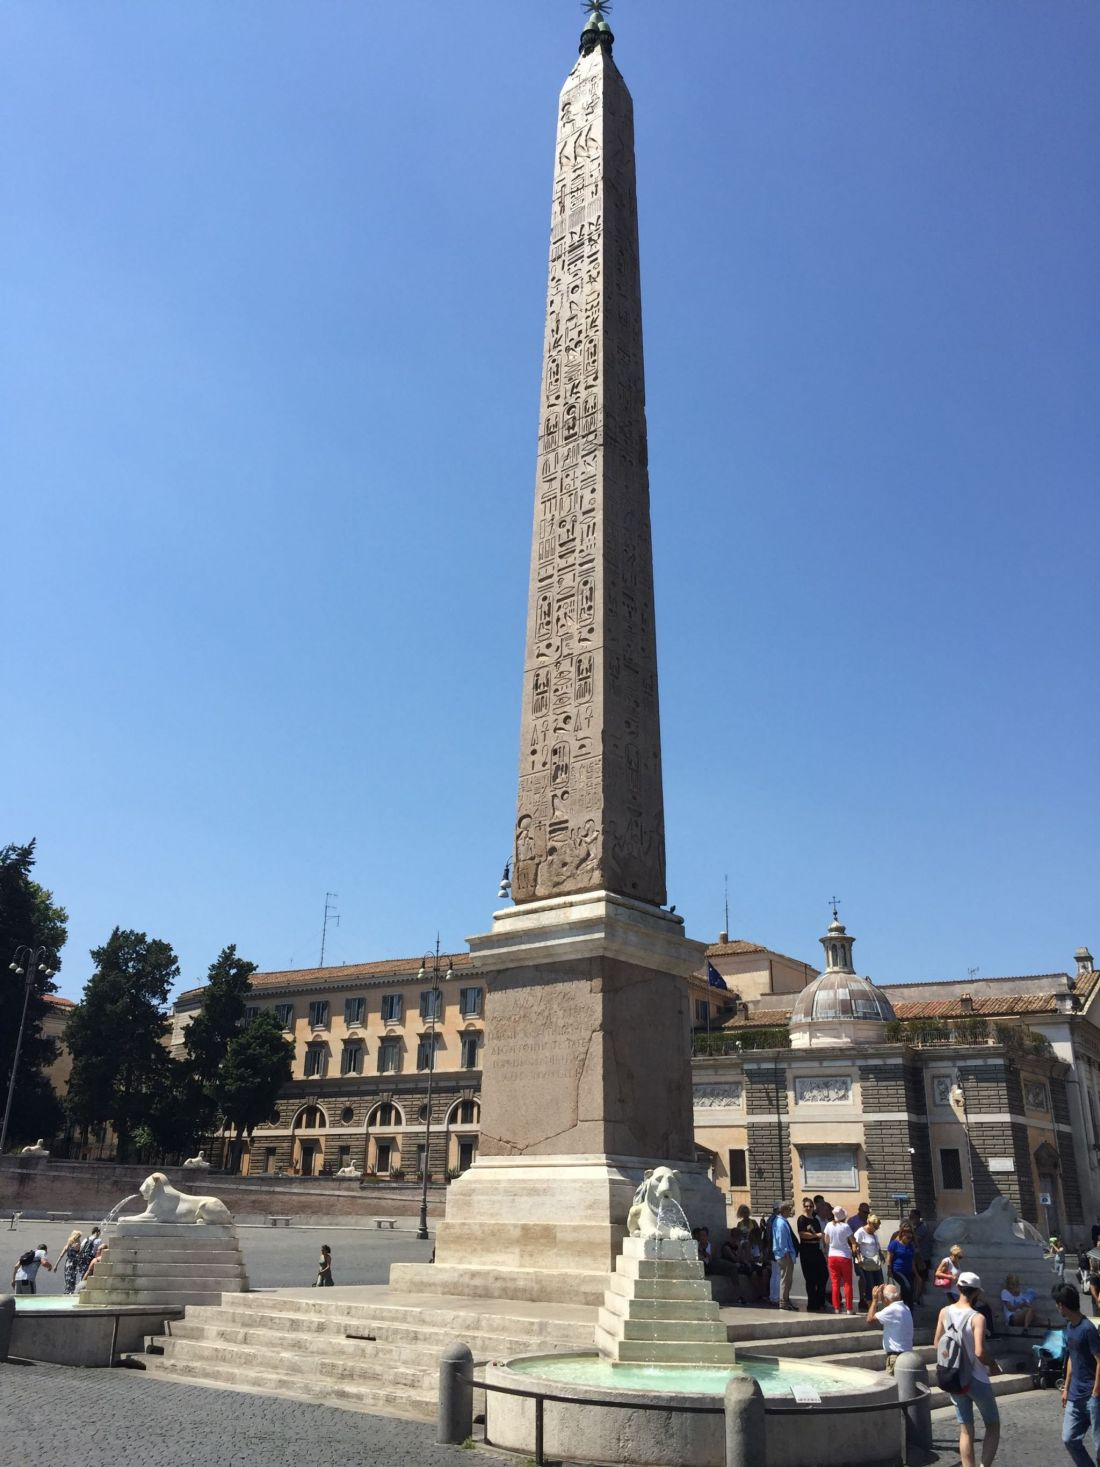 Flaminio Obelisk, Rome